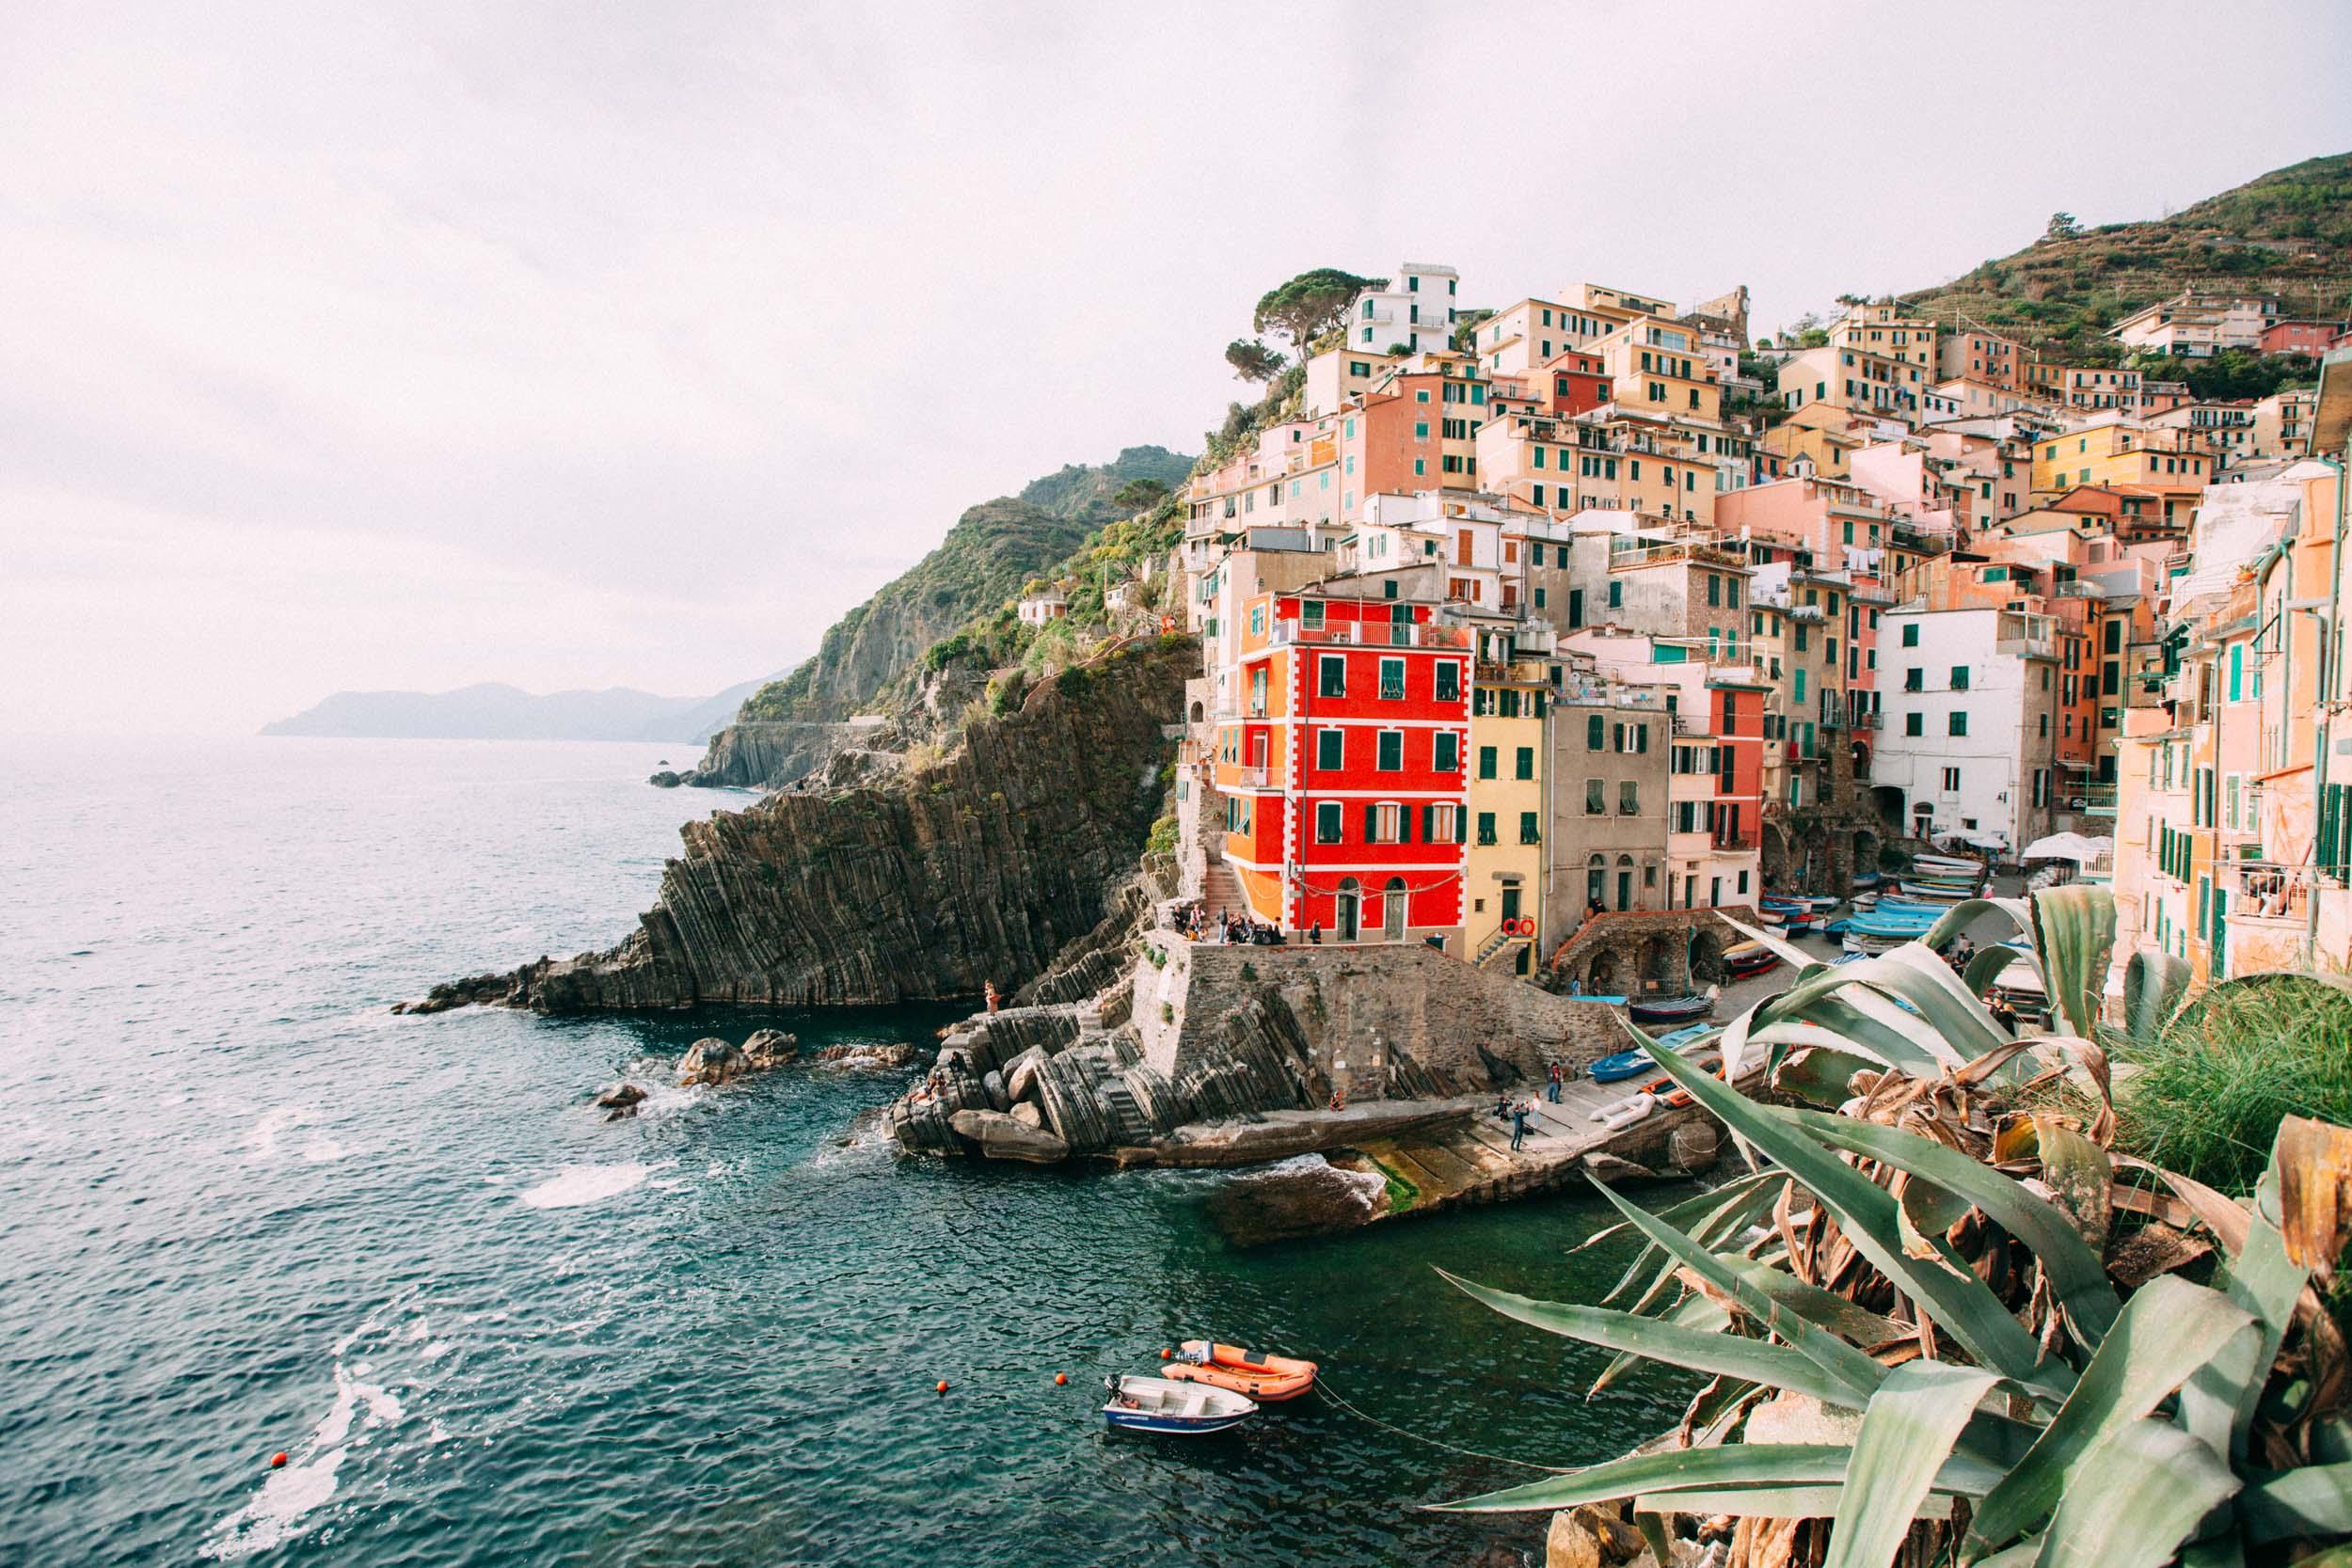 Flytographer Gaia's Local Guide to Cinque Terre